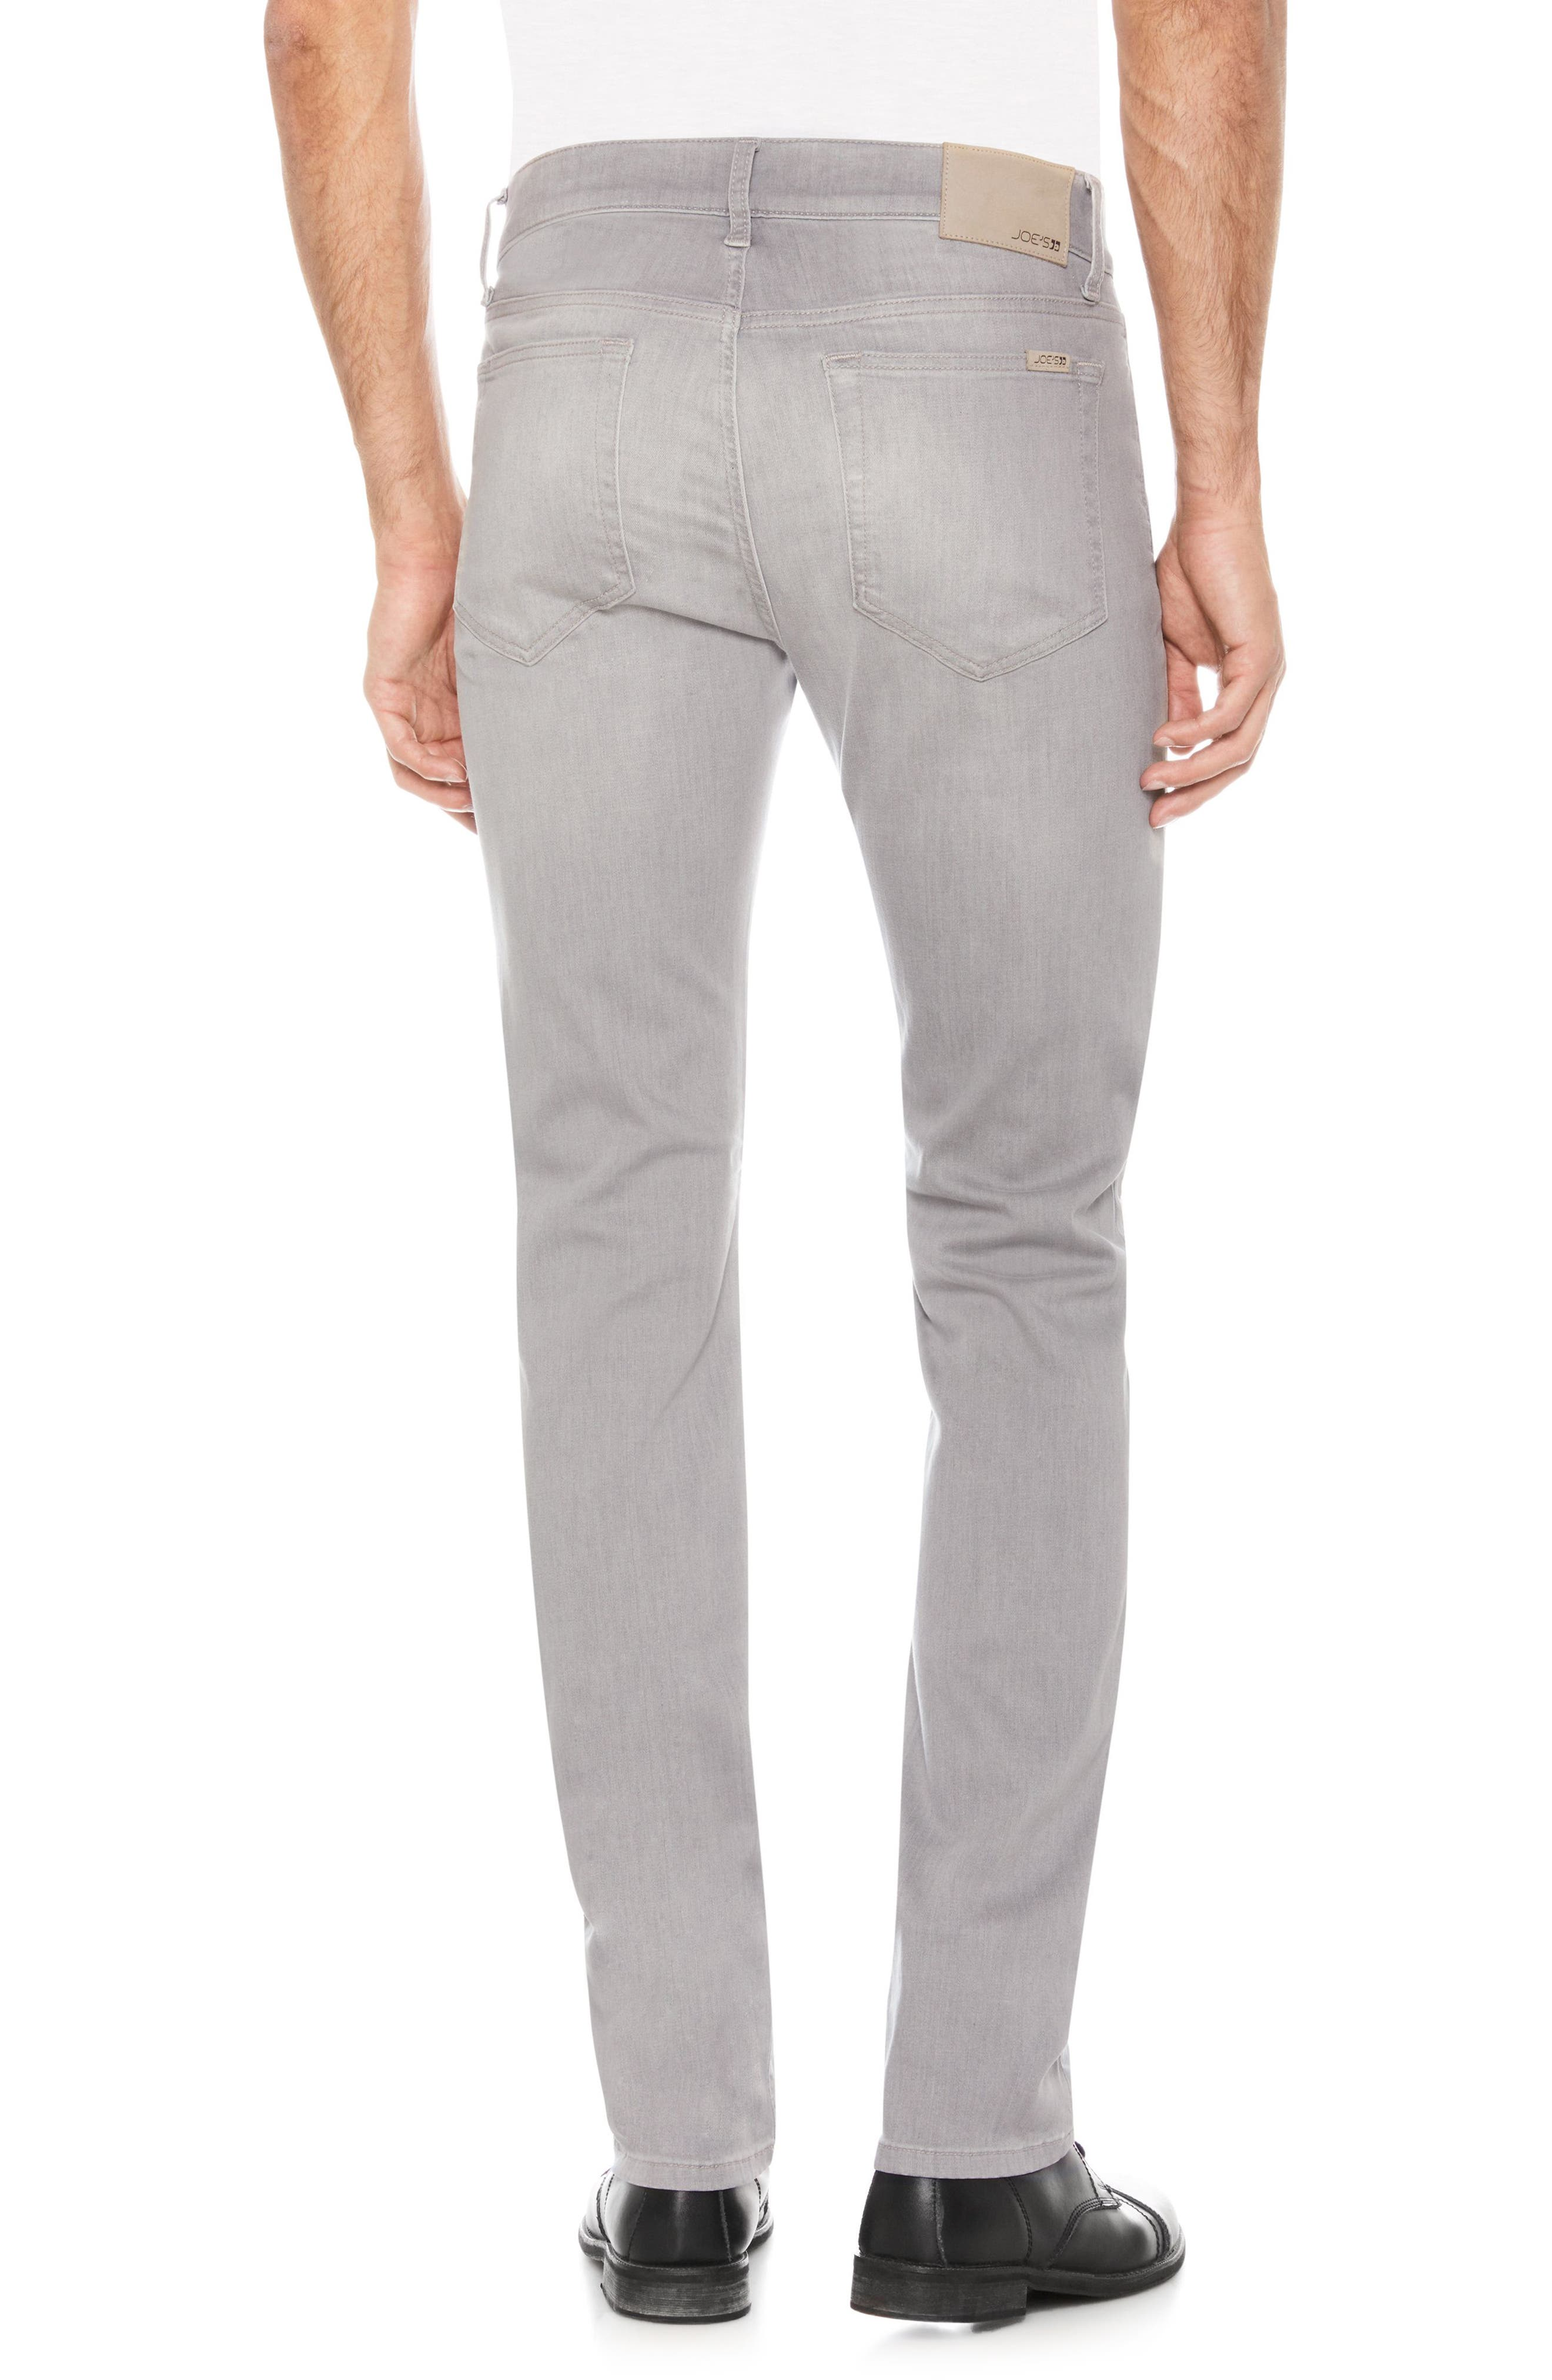 Brixton Slim Straight Fit Jeans,                             Alternate thumbnail 2, color,                             Steve